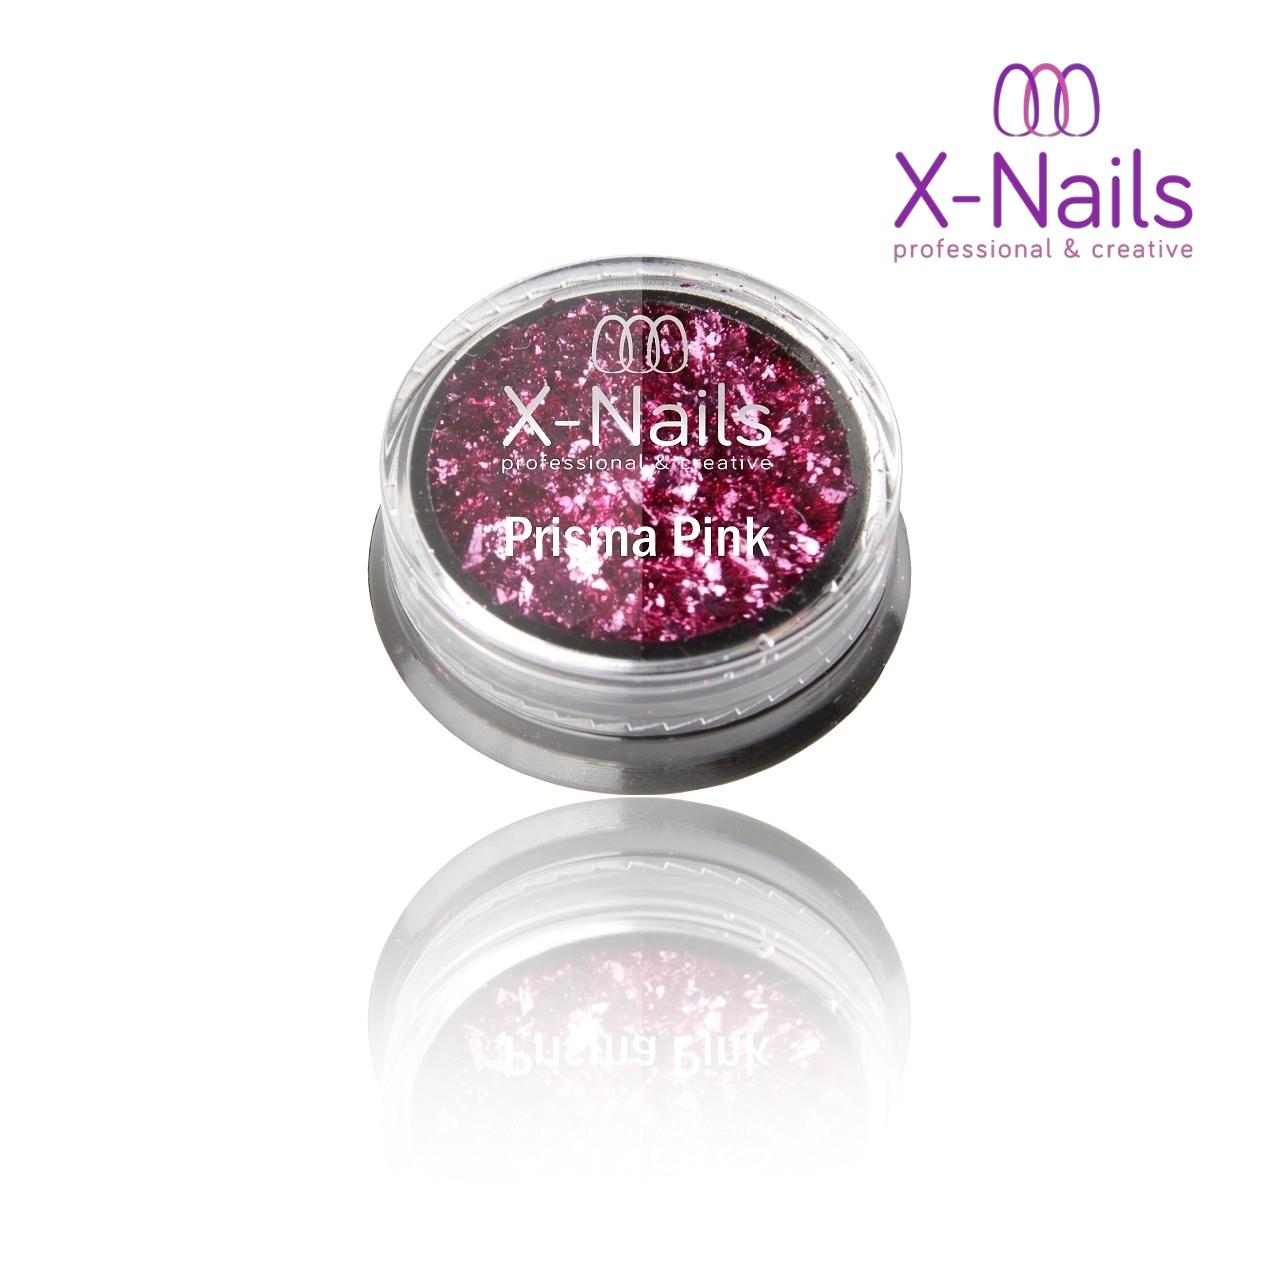 X Nails Zrcadlovy Lestici Pigment Na Nehty Prisma Pink X Nails Gelove Akrylove Nehty